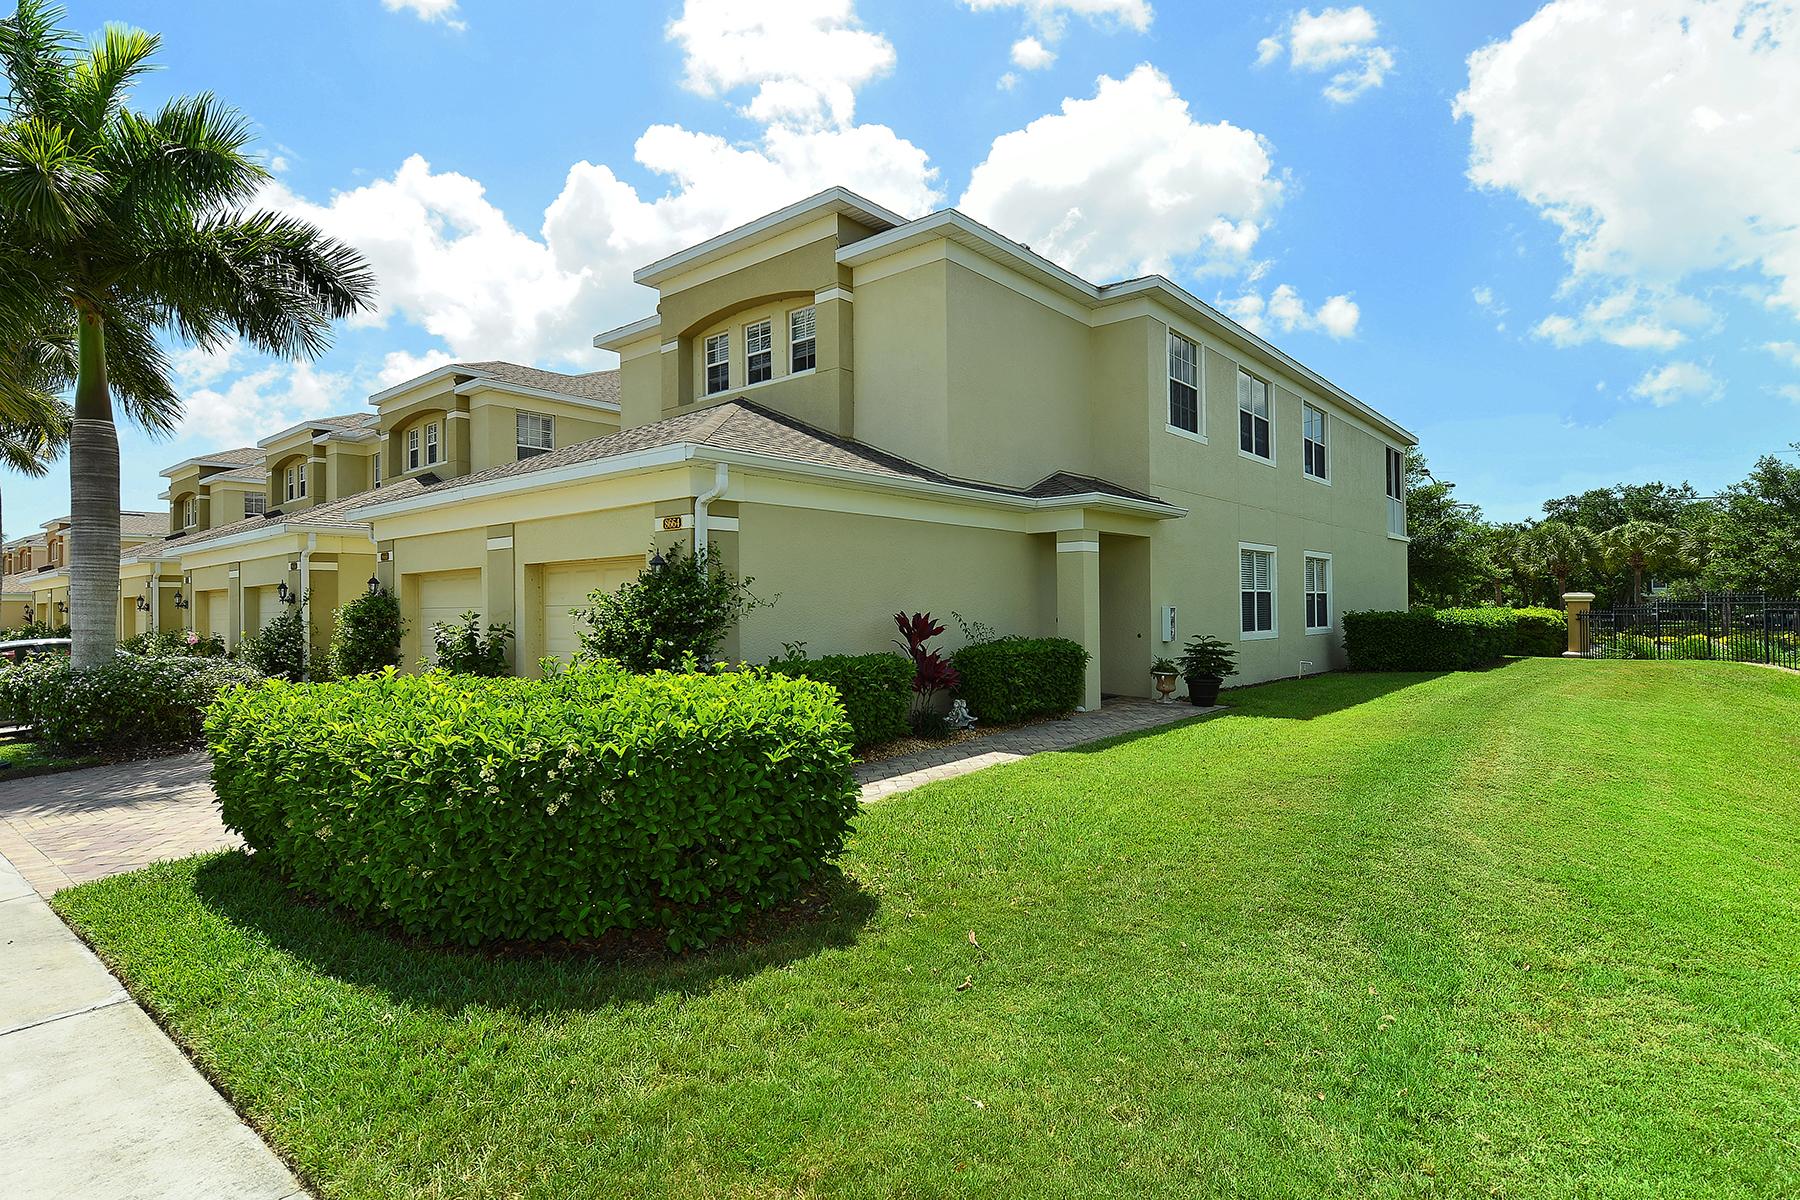 Condominium for Sale at SARASOTA 8664 Karpeal Dr 208 Sarasota, Florida, 34238 United States